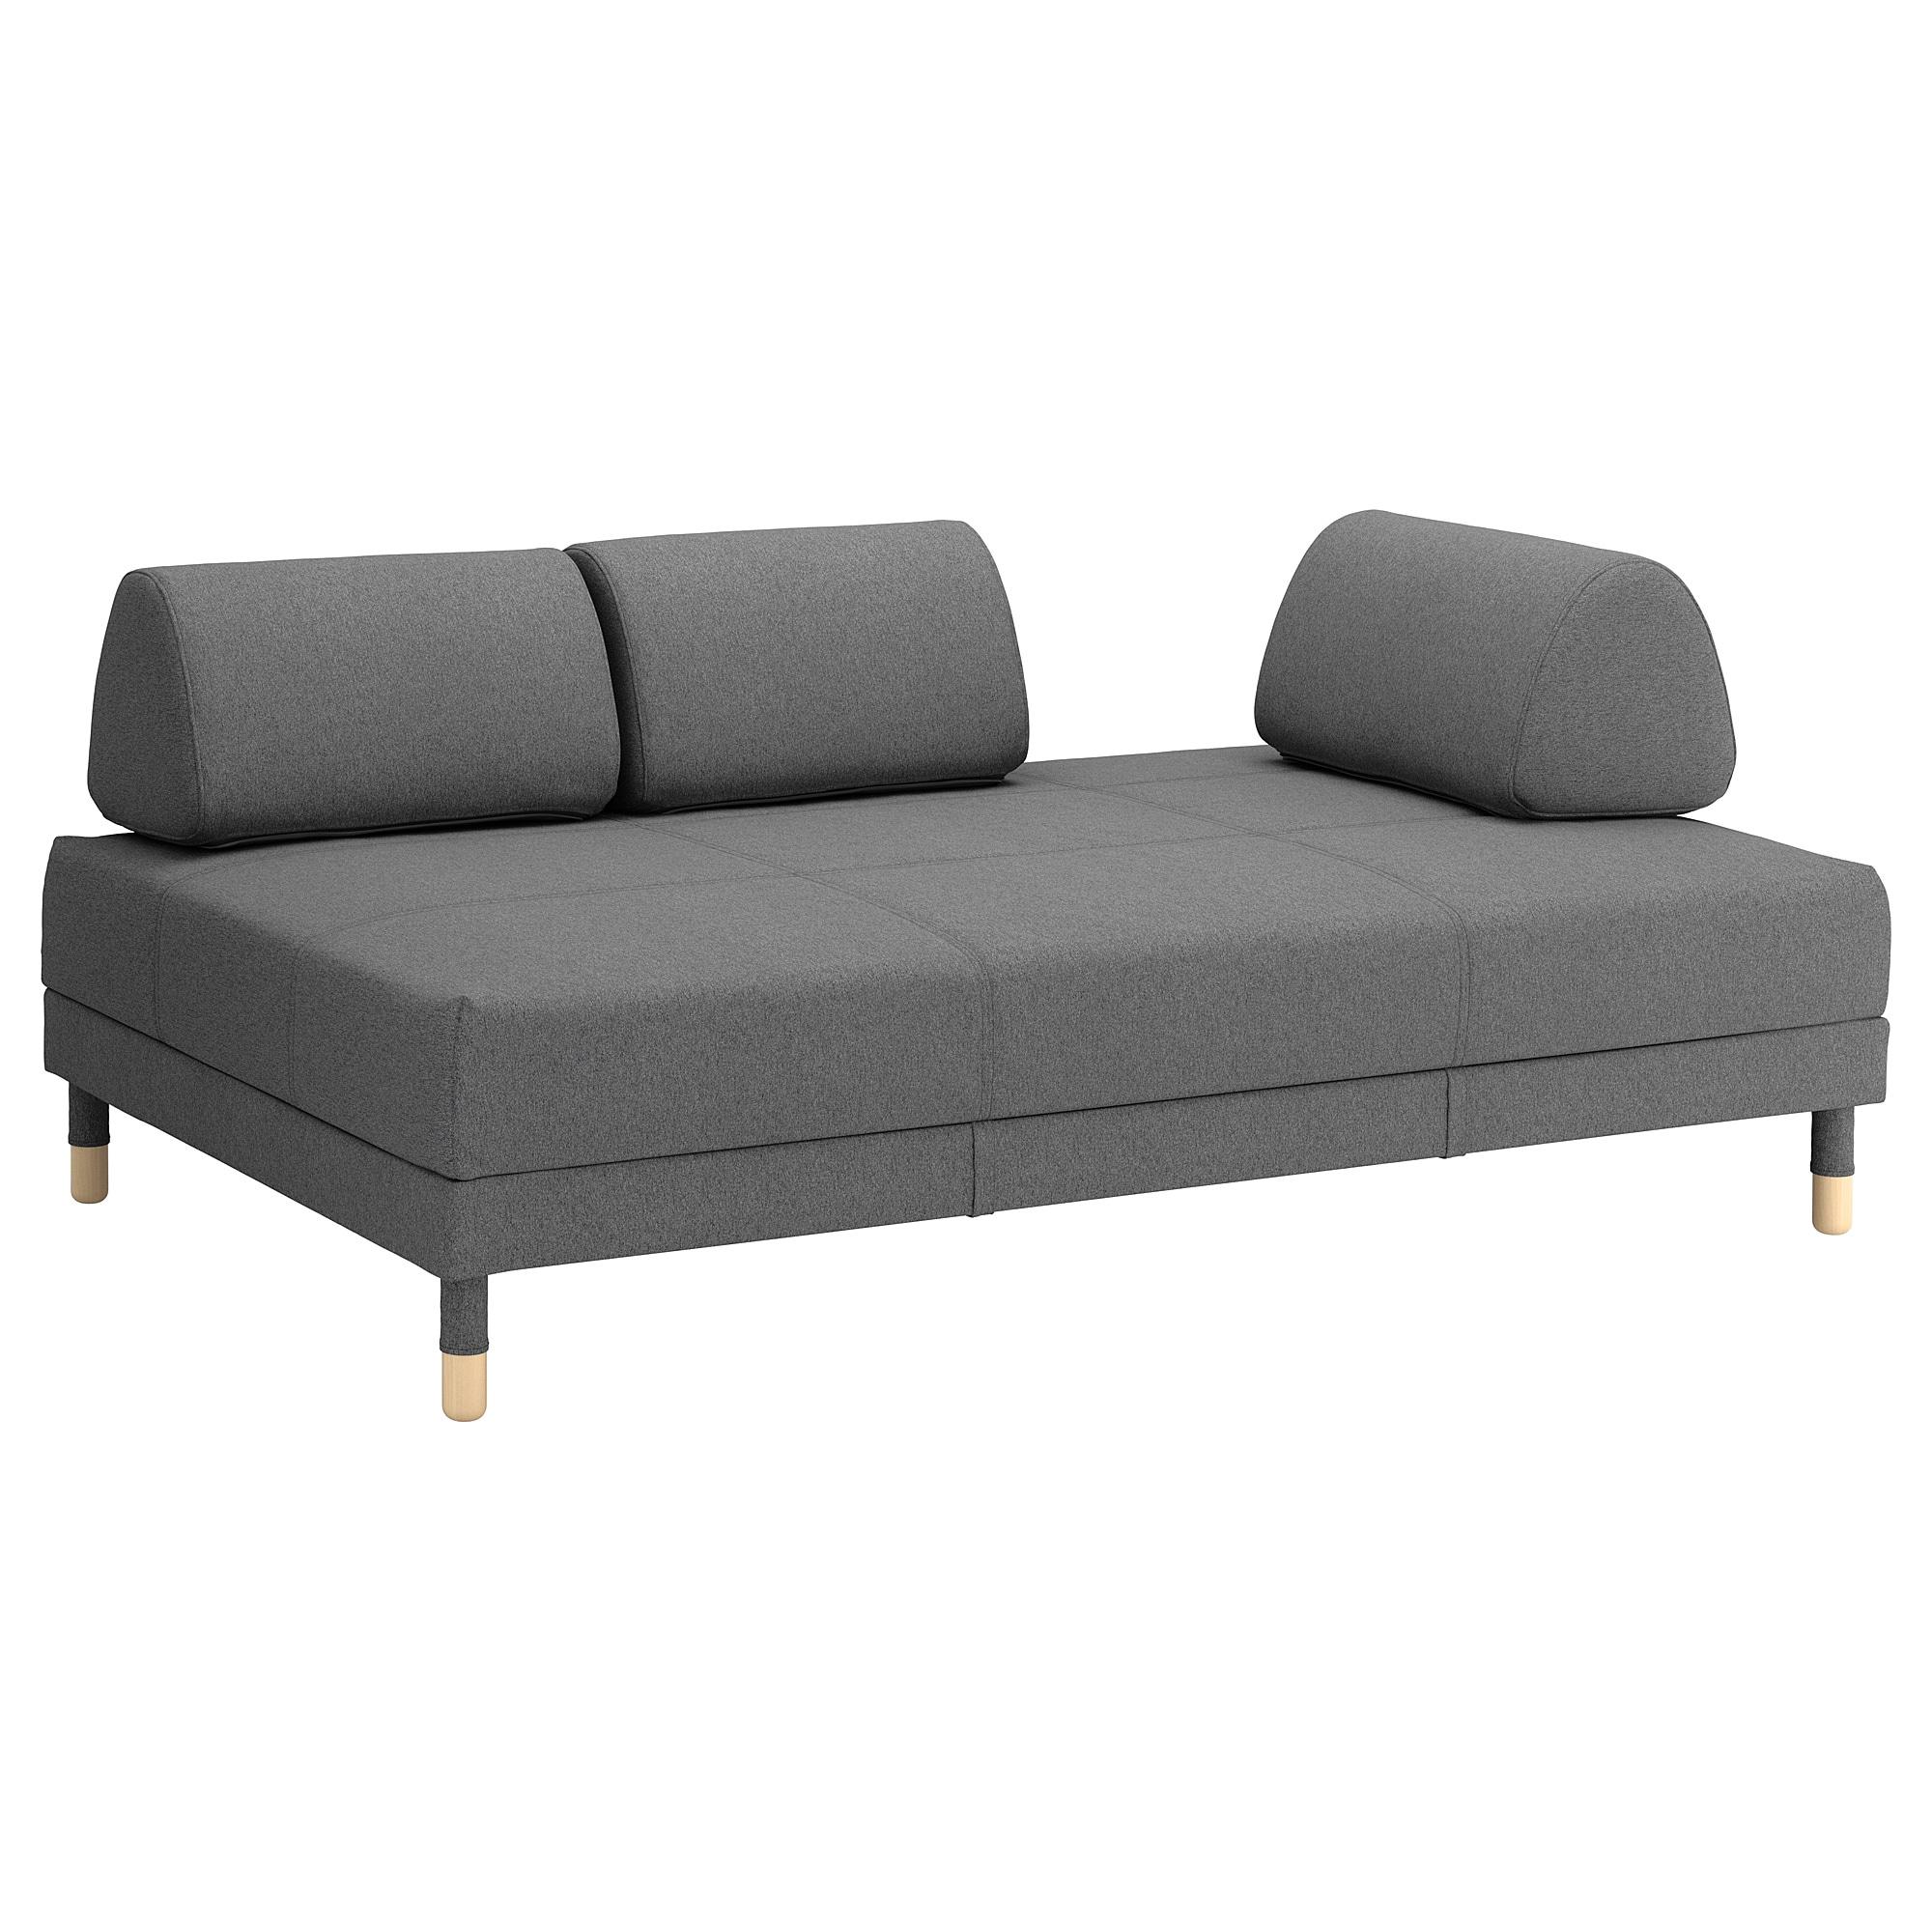 Sillon Cama Barato Zwd9 sofà S Cama De Calidad Pra Online Ikea